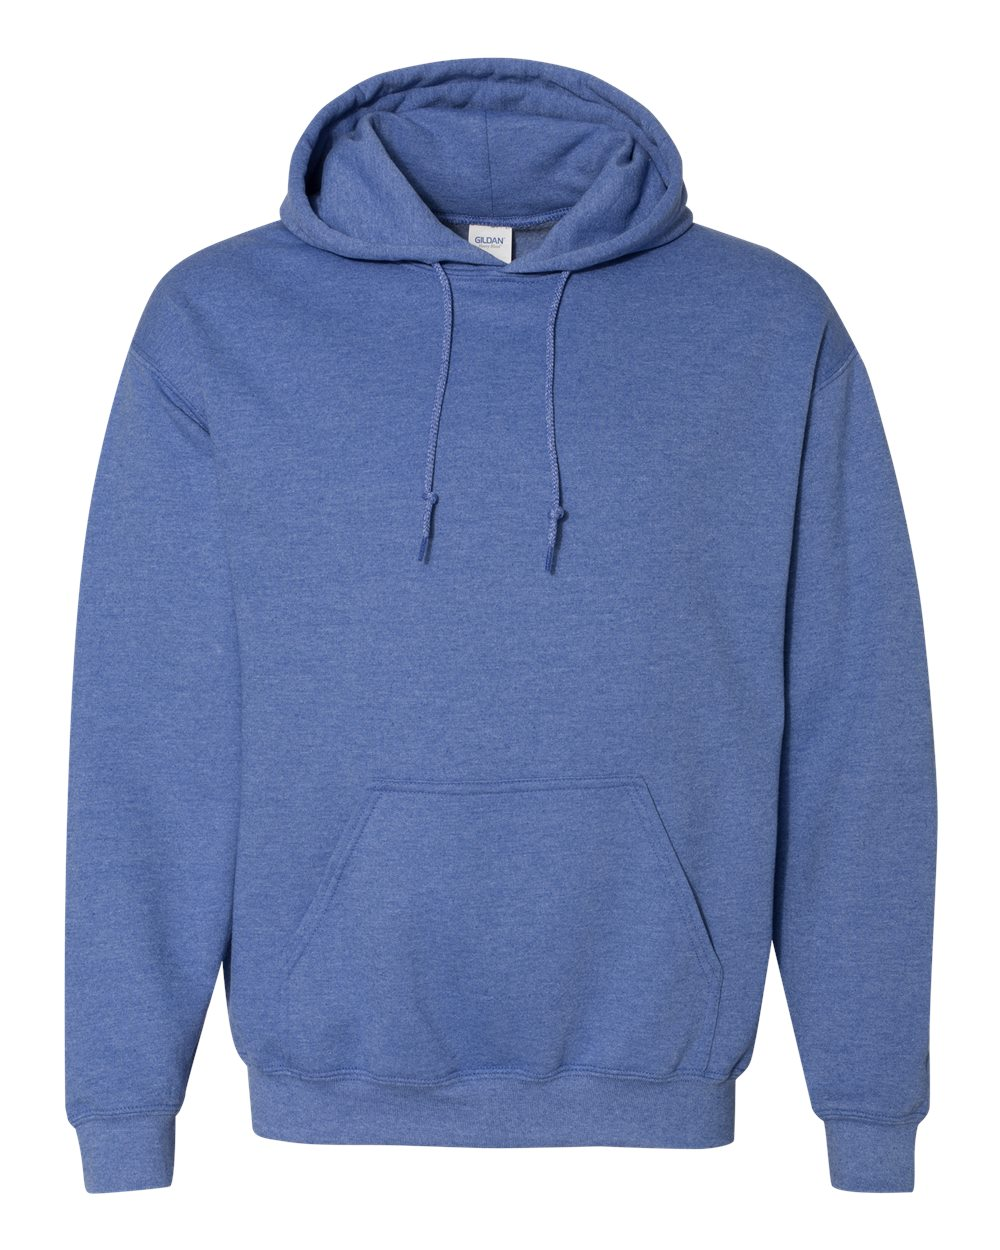 Gildan-Mens-Blank-Hoodie-Heavy-Blend-Hooded-Sweatshirt-18500-up-to-5XL thumbnail 30